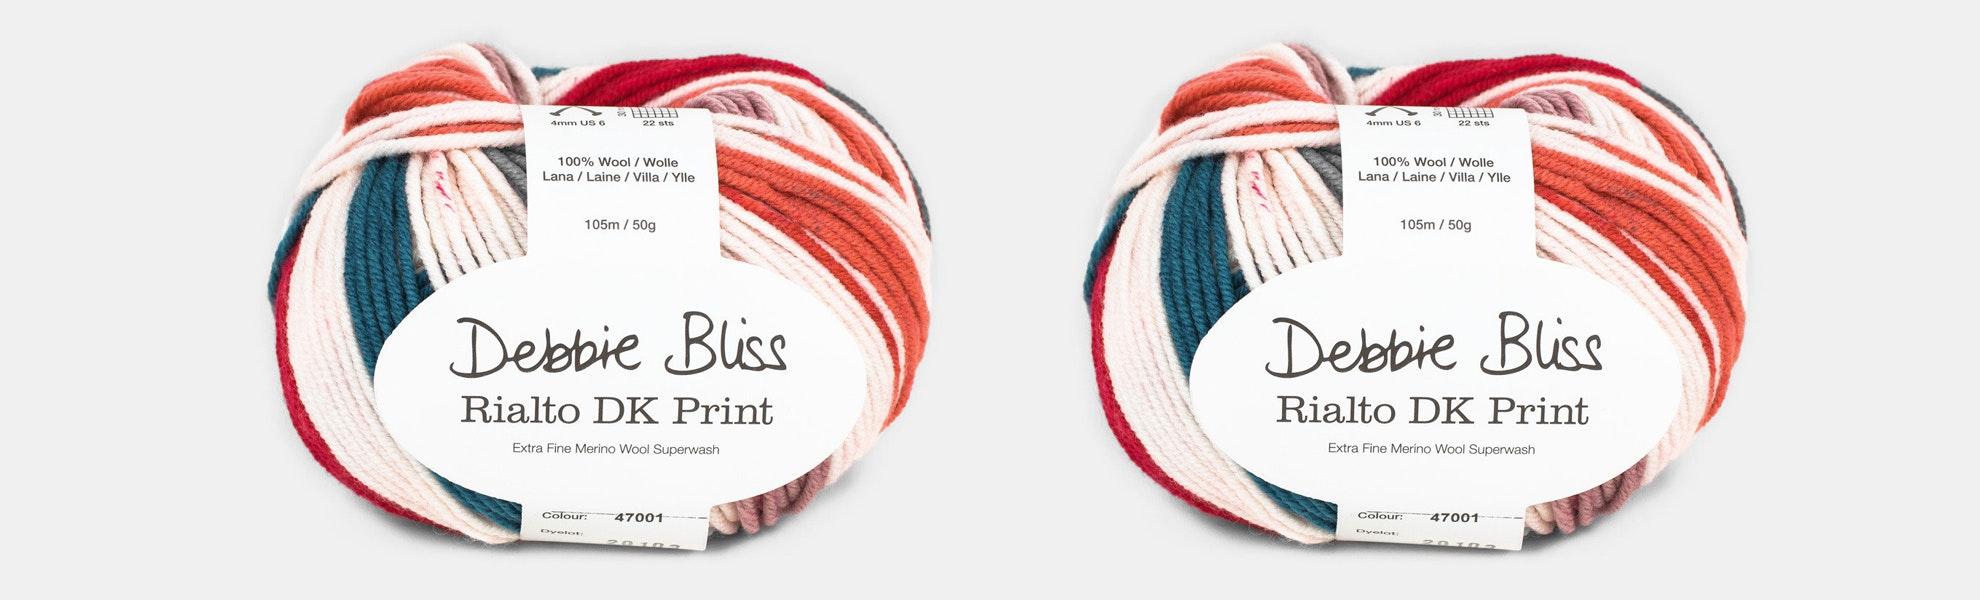 Rialto DK Prints Yarn by Debbie Bliss (2-Pack)